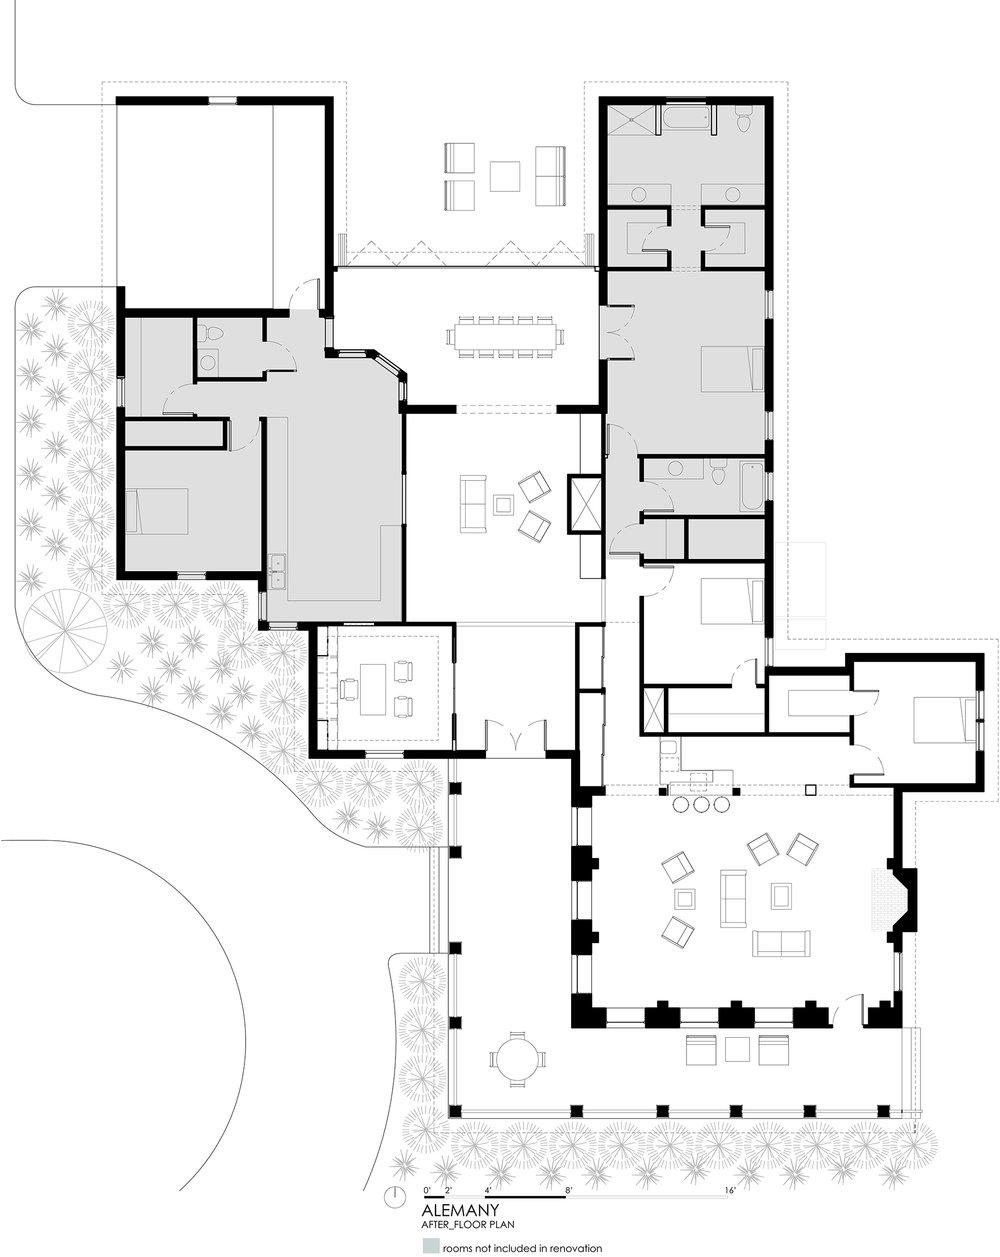 Alemany_After Floor Plan sm.jpg